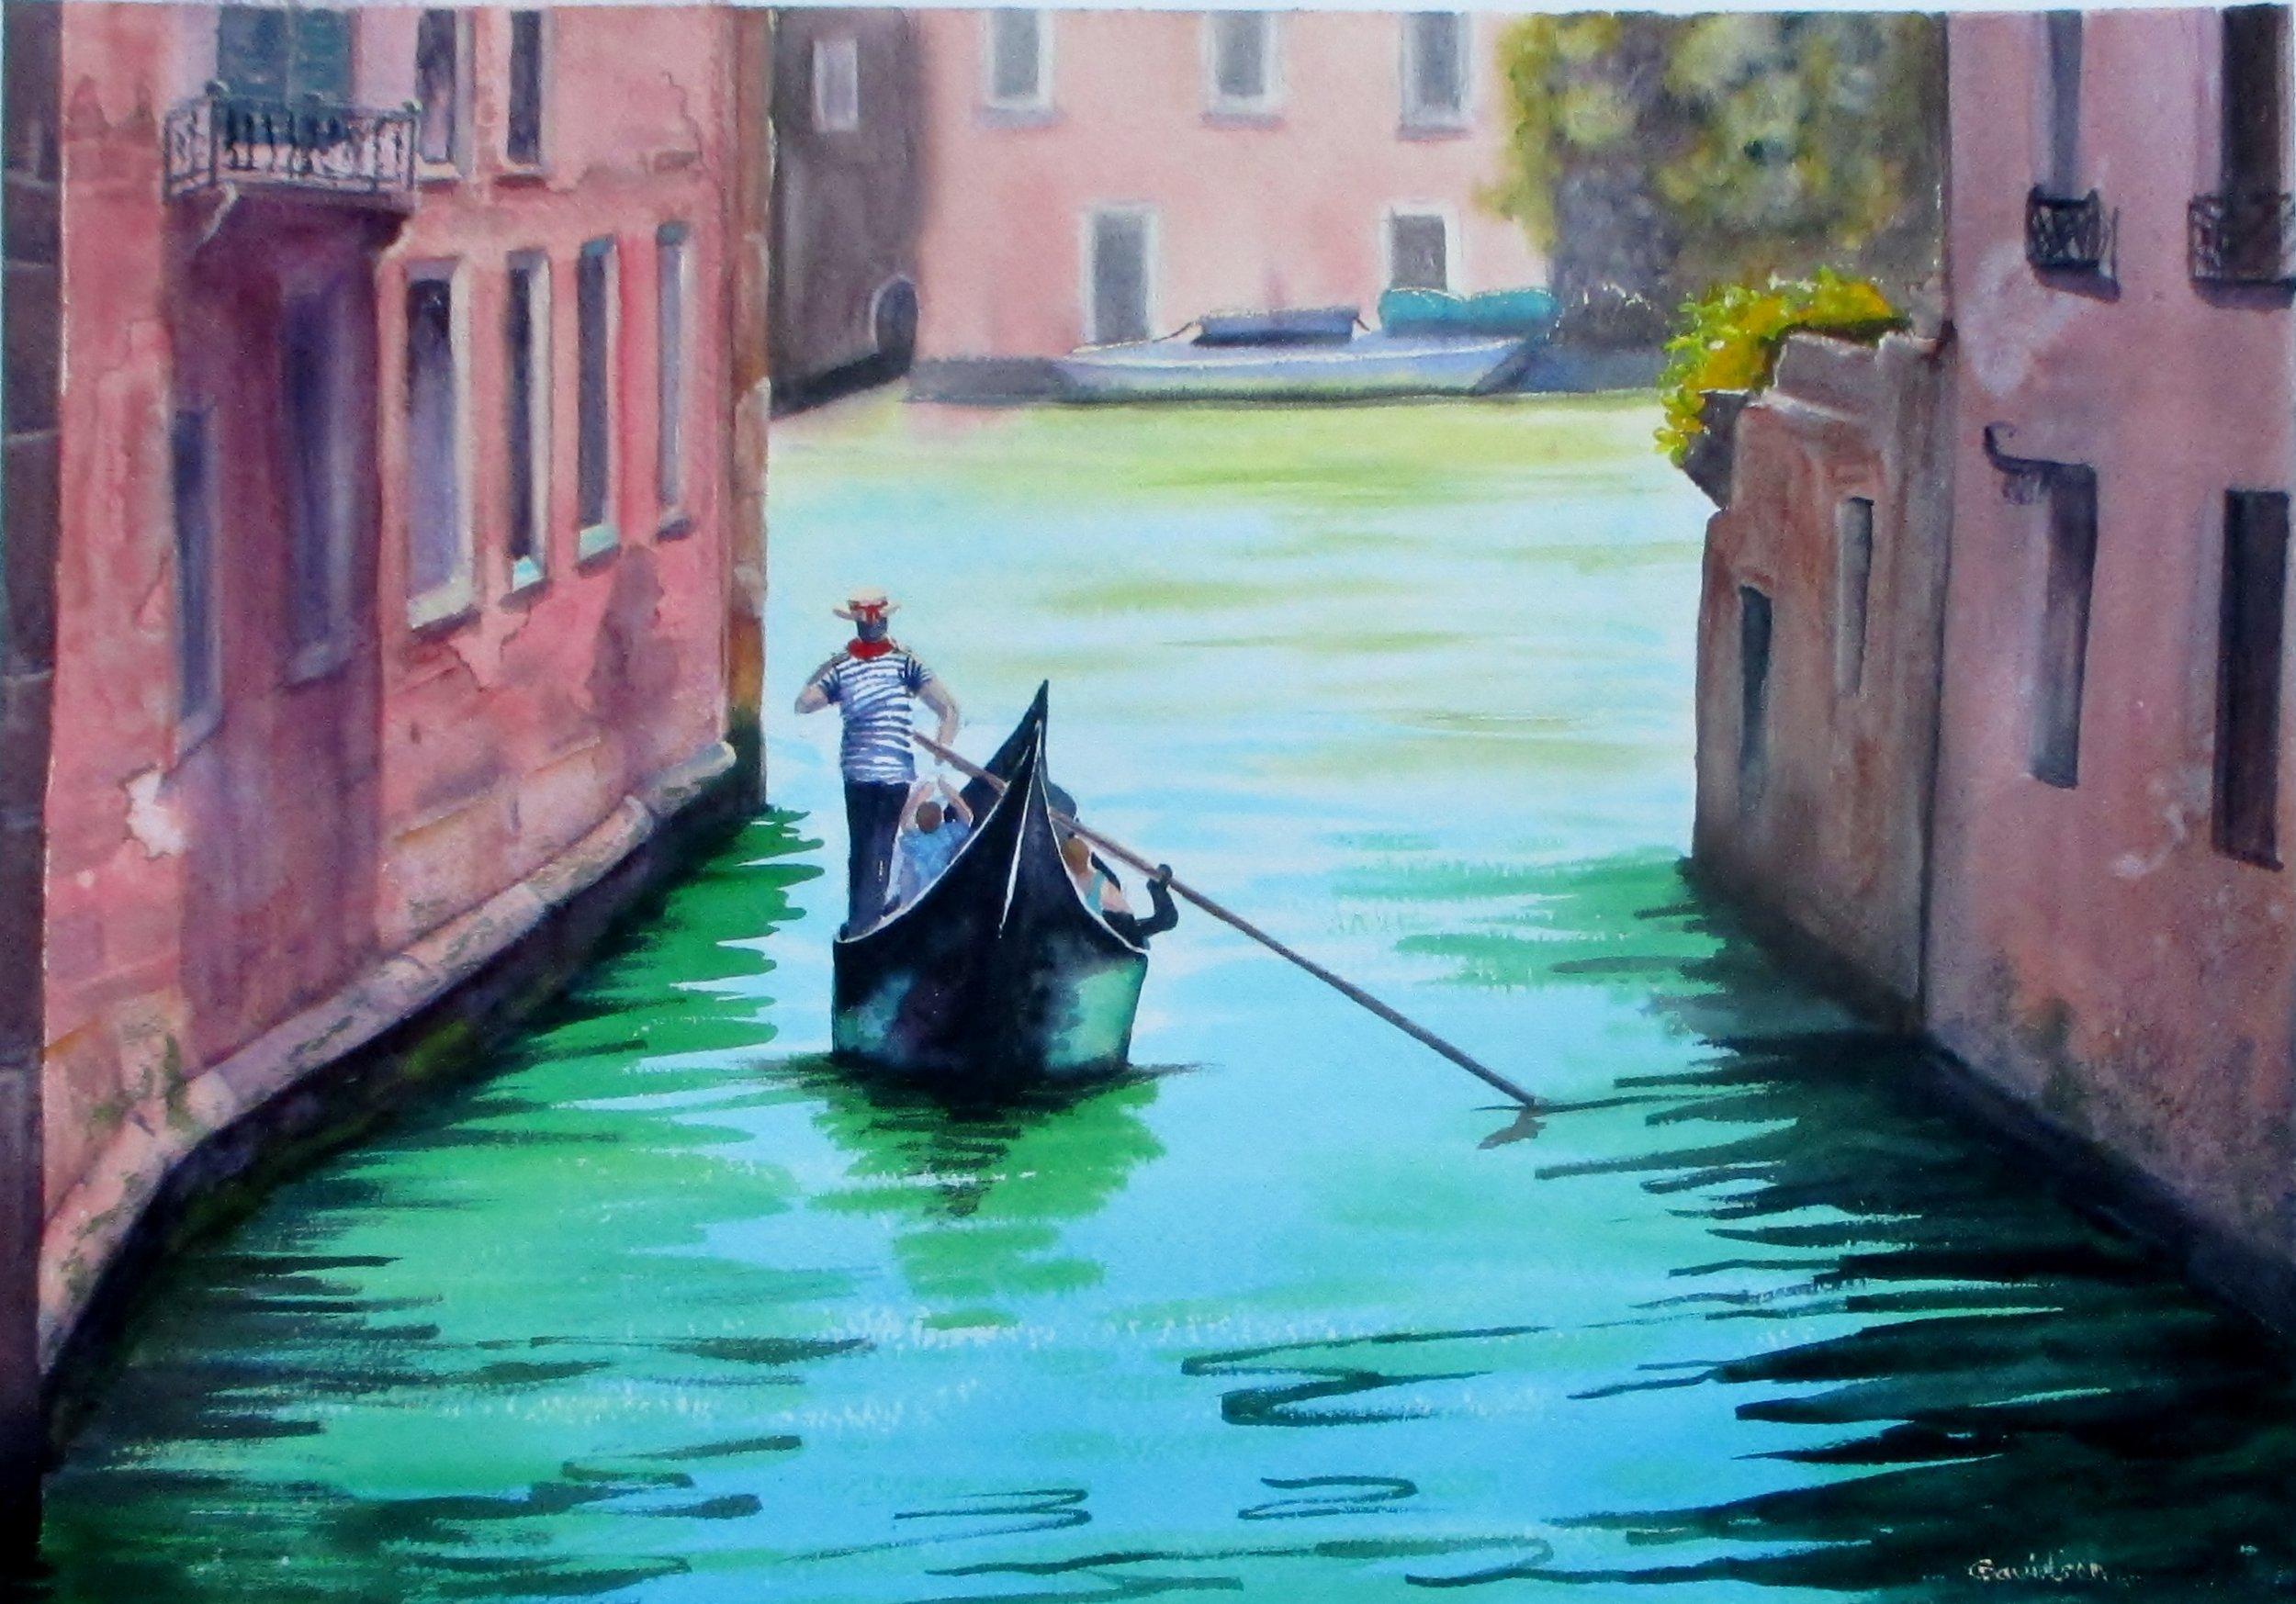 Carol Davidson - Into The Light, Venice